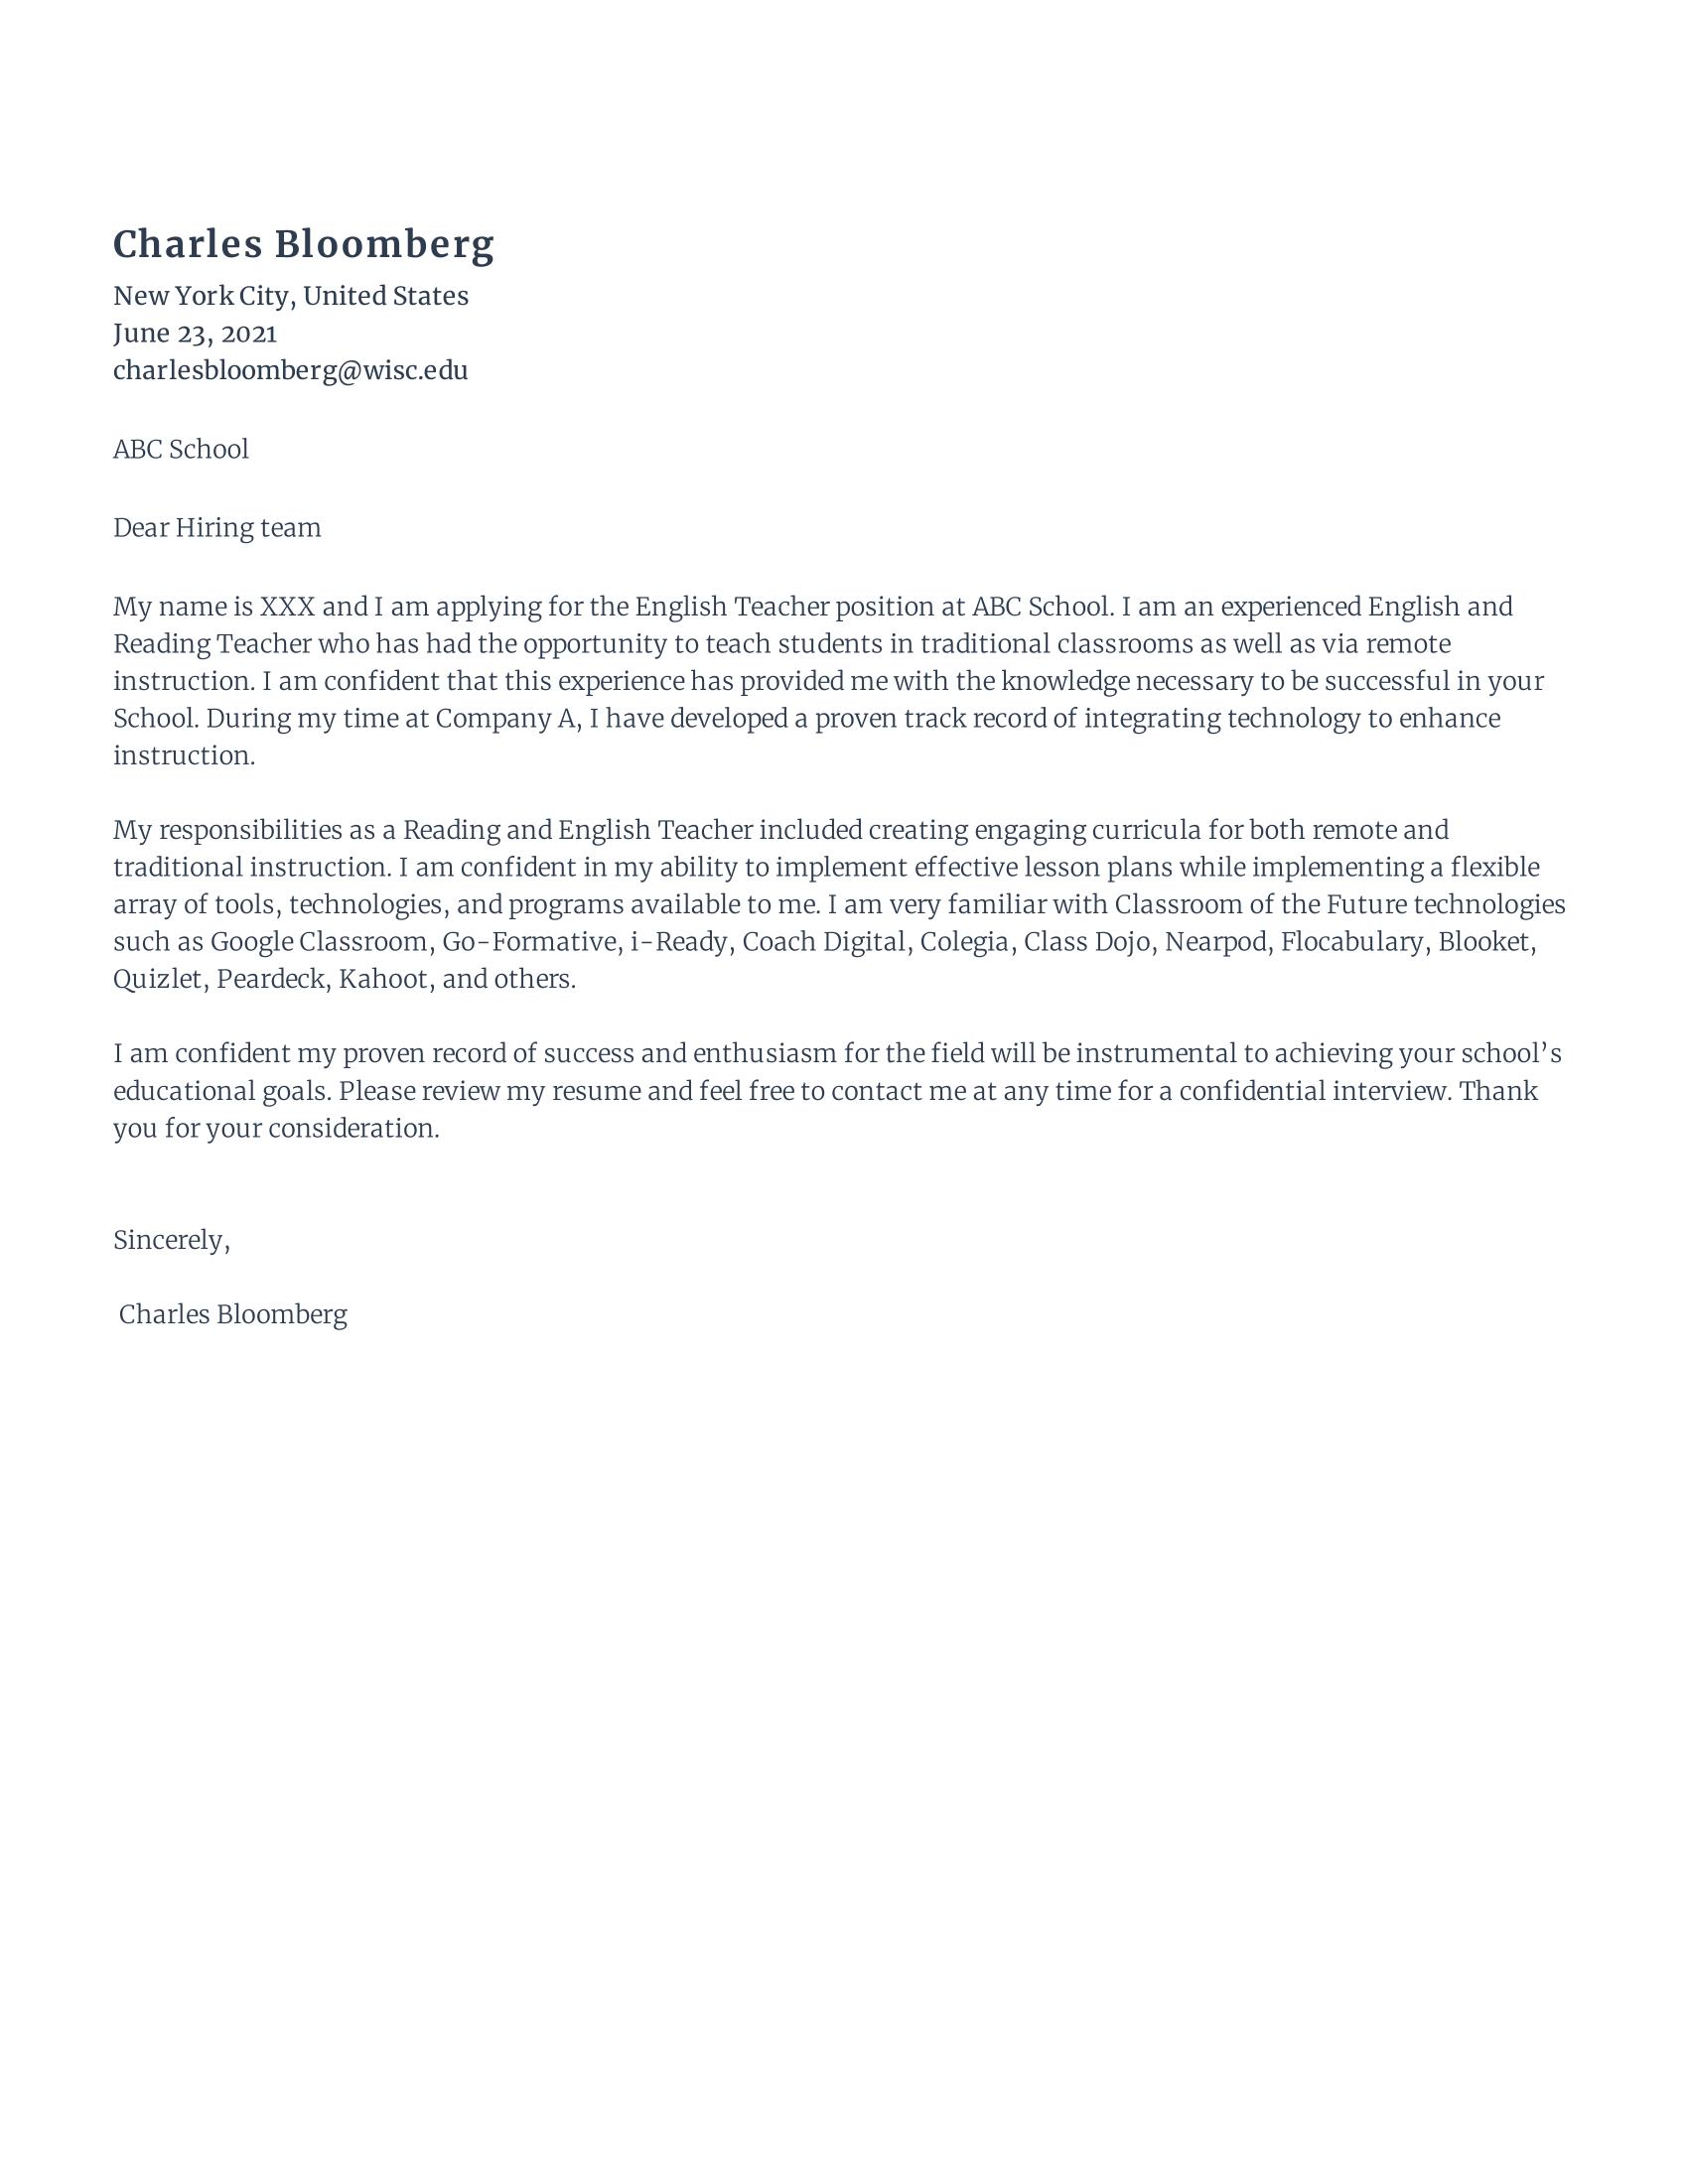 English Language Teacher Cover Letter